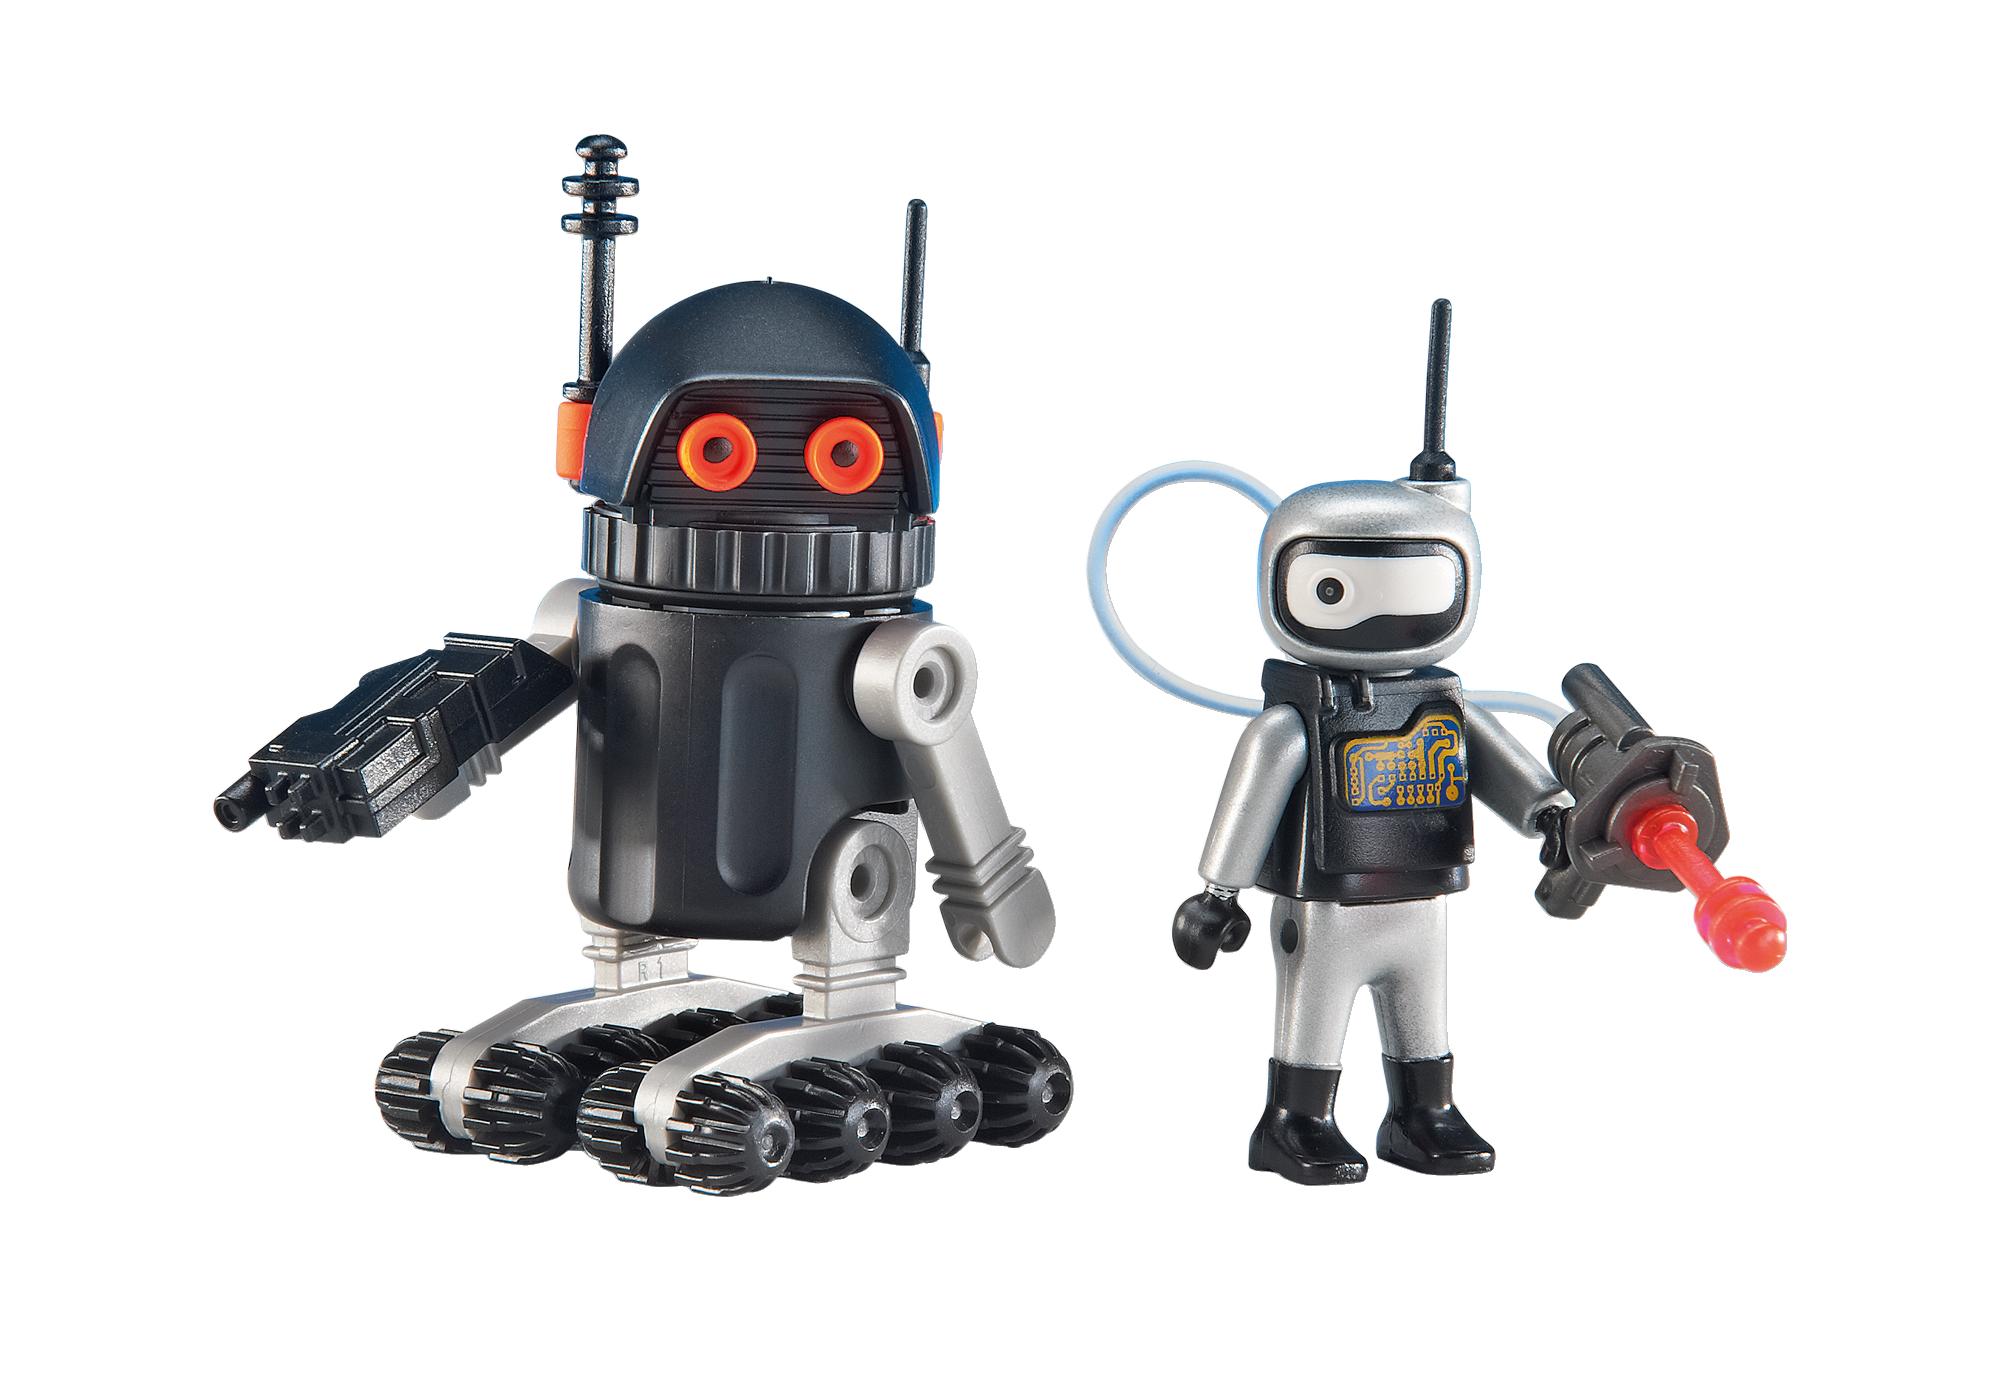 http://media.playmobil.com/i/playmobil/6511_product_detail/Weltraumroboter